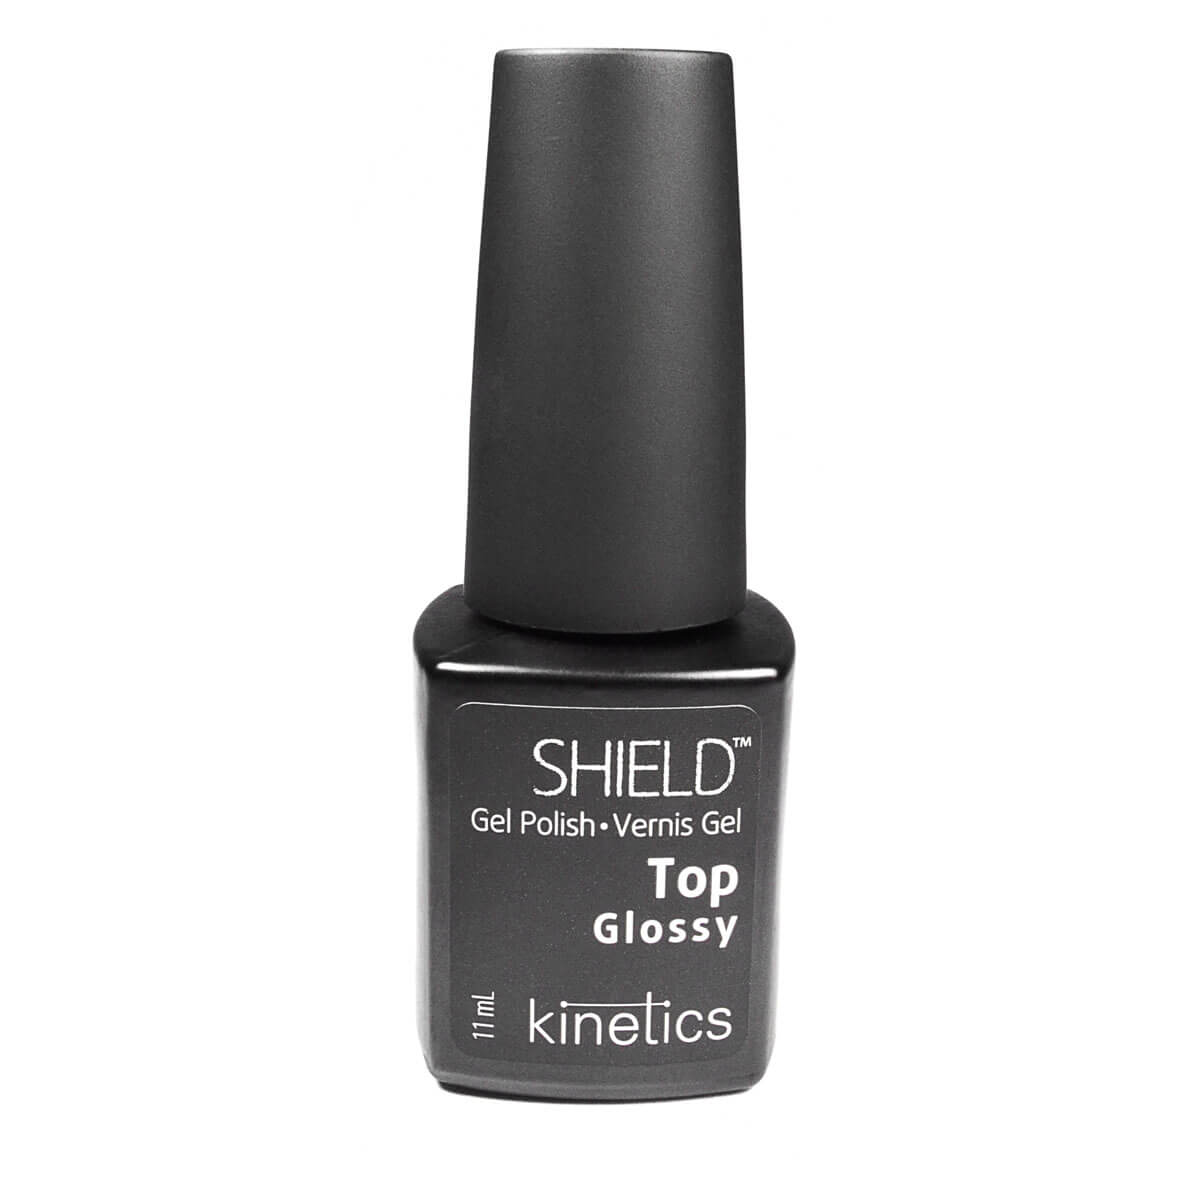 Shield Gel Polish Glossy Top Kinetics Gel para Unhas 11ml